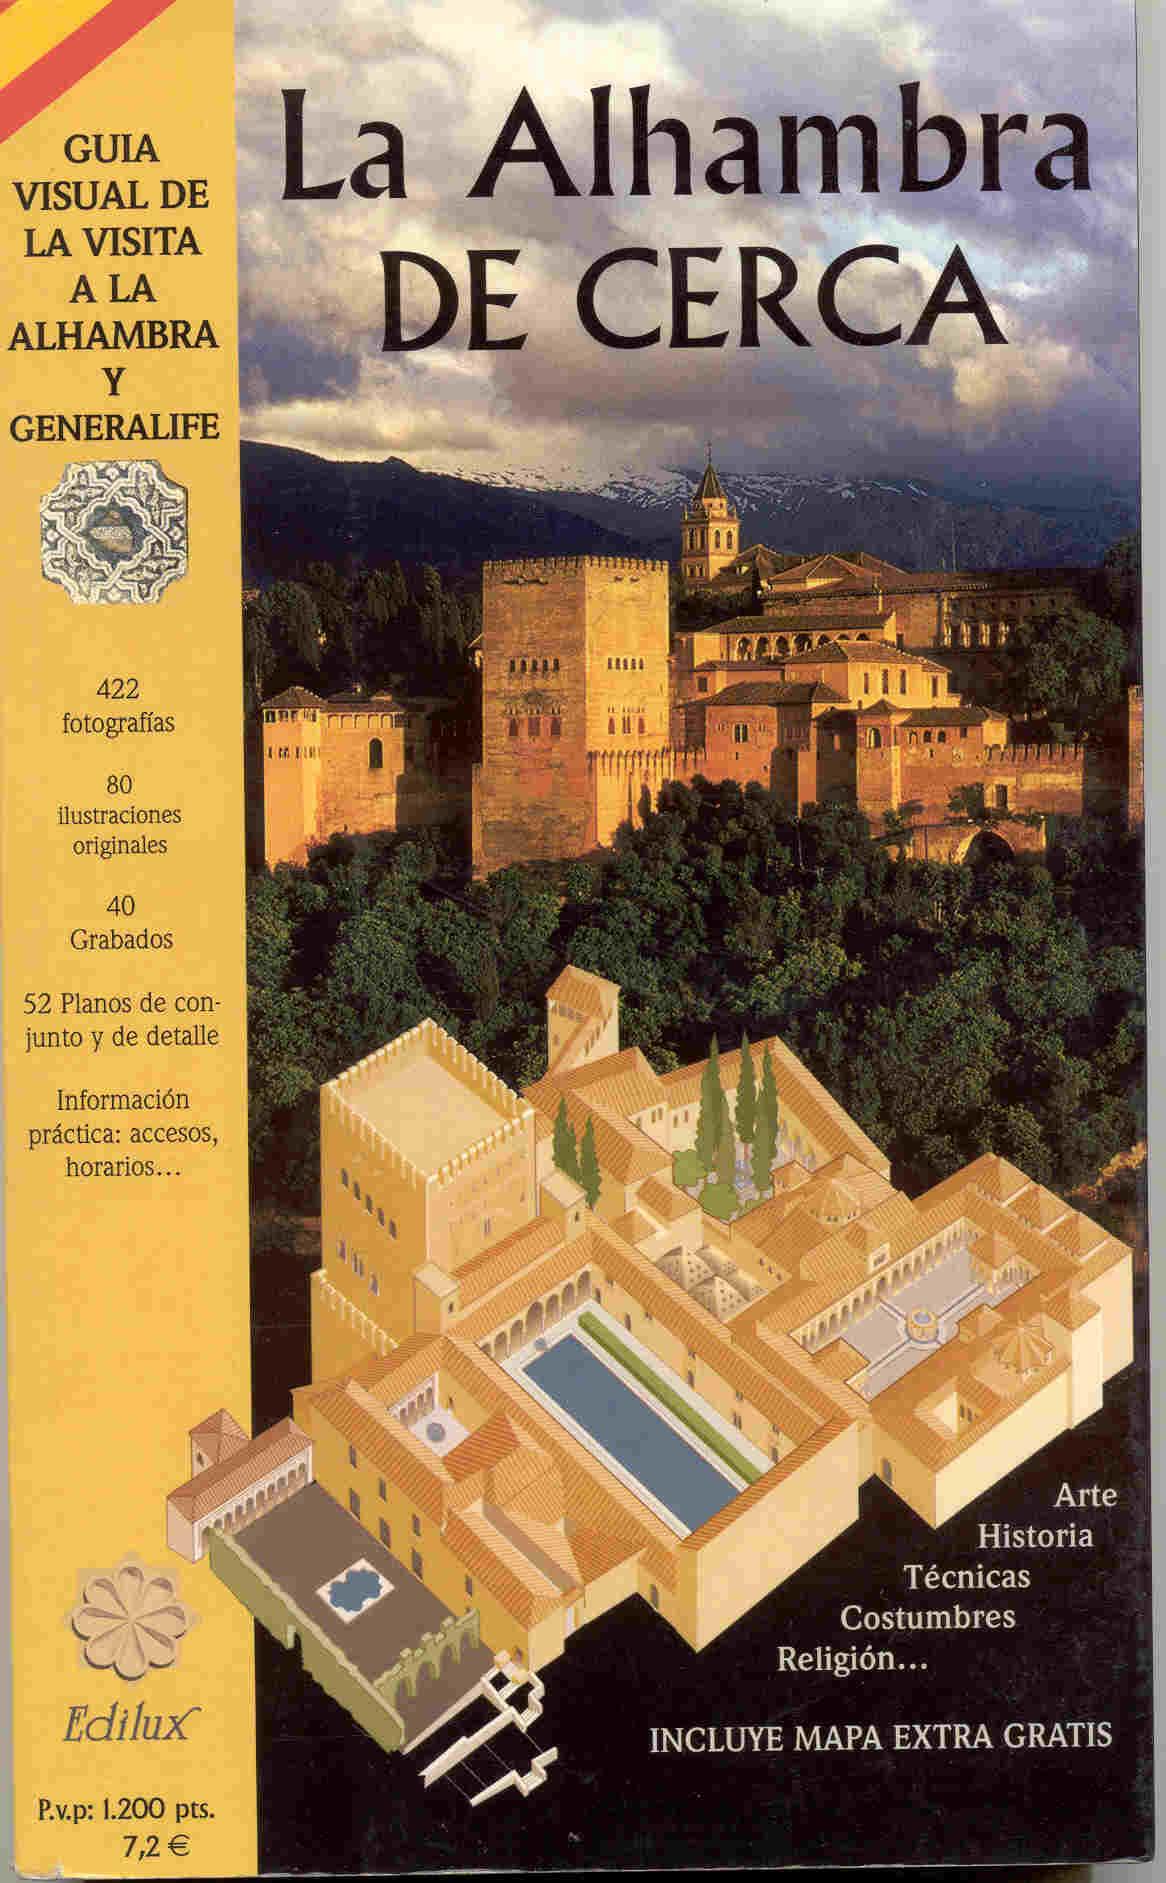 La Alhambra de cerca